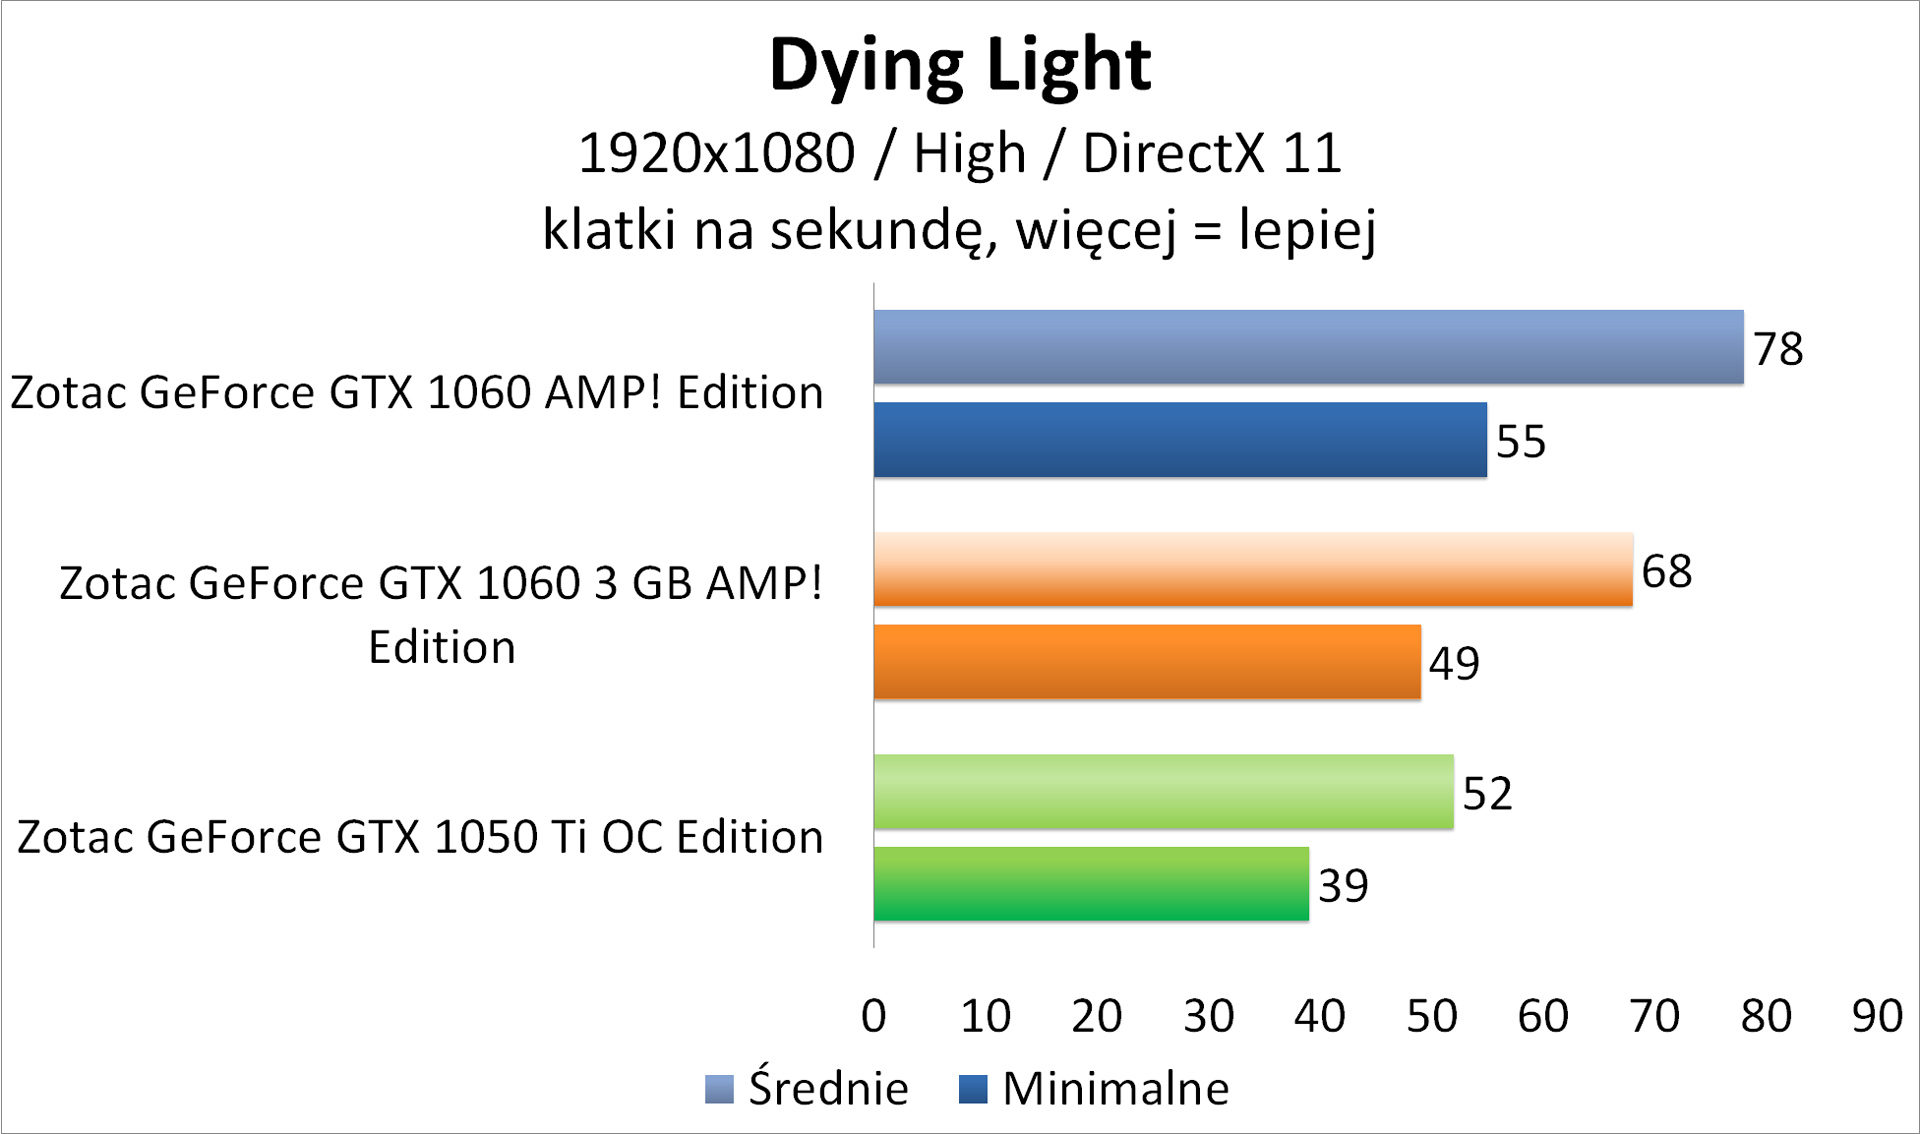 Zotac GeForce GTX 1050 Ti OC Edition - Dying Light